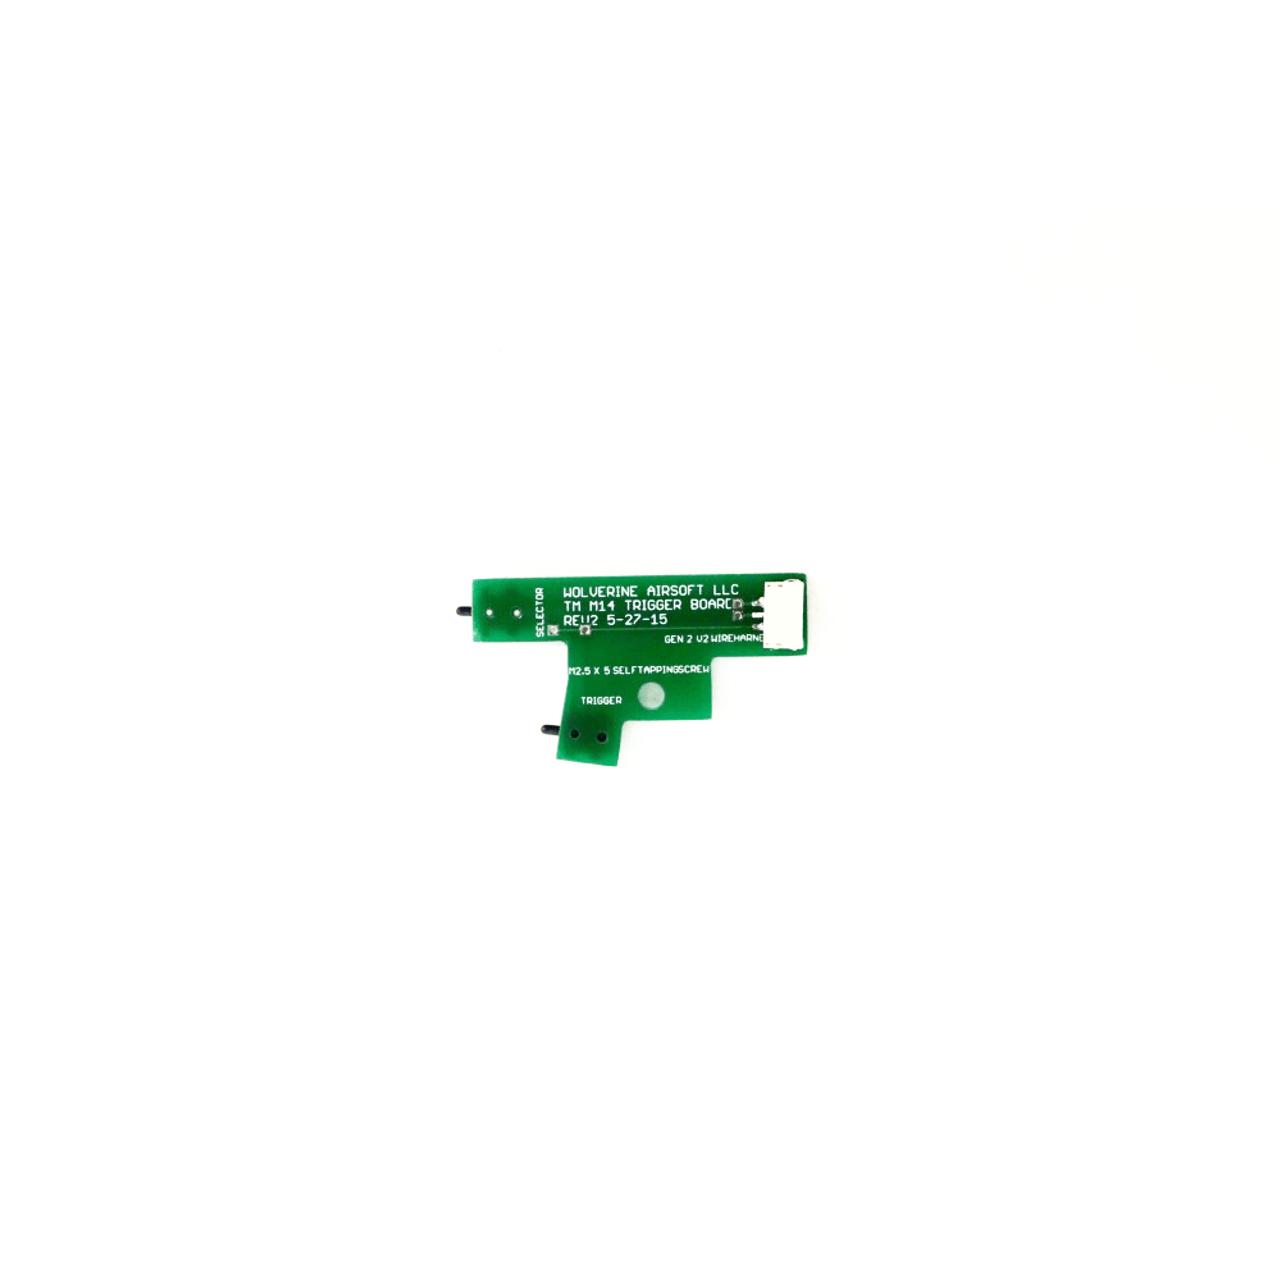 Wolverine Airsoft - Custom TM M14 Trigger Board for HYDRA Unit